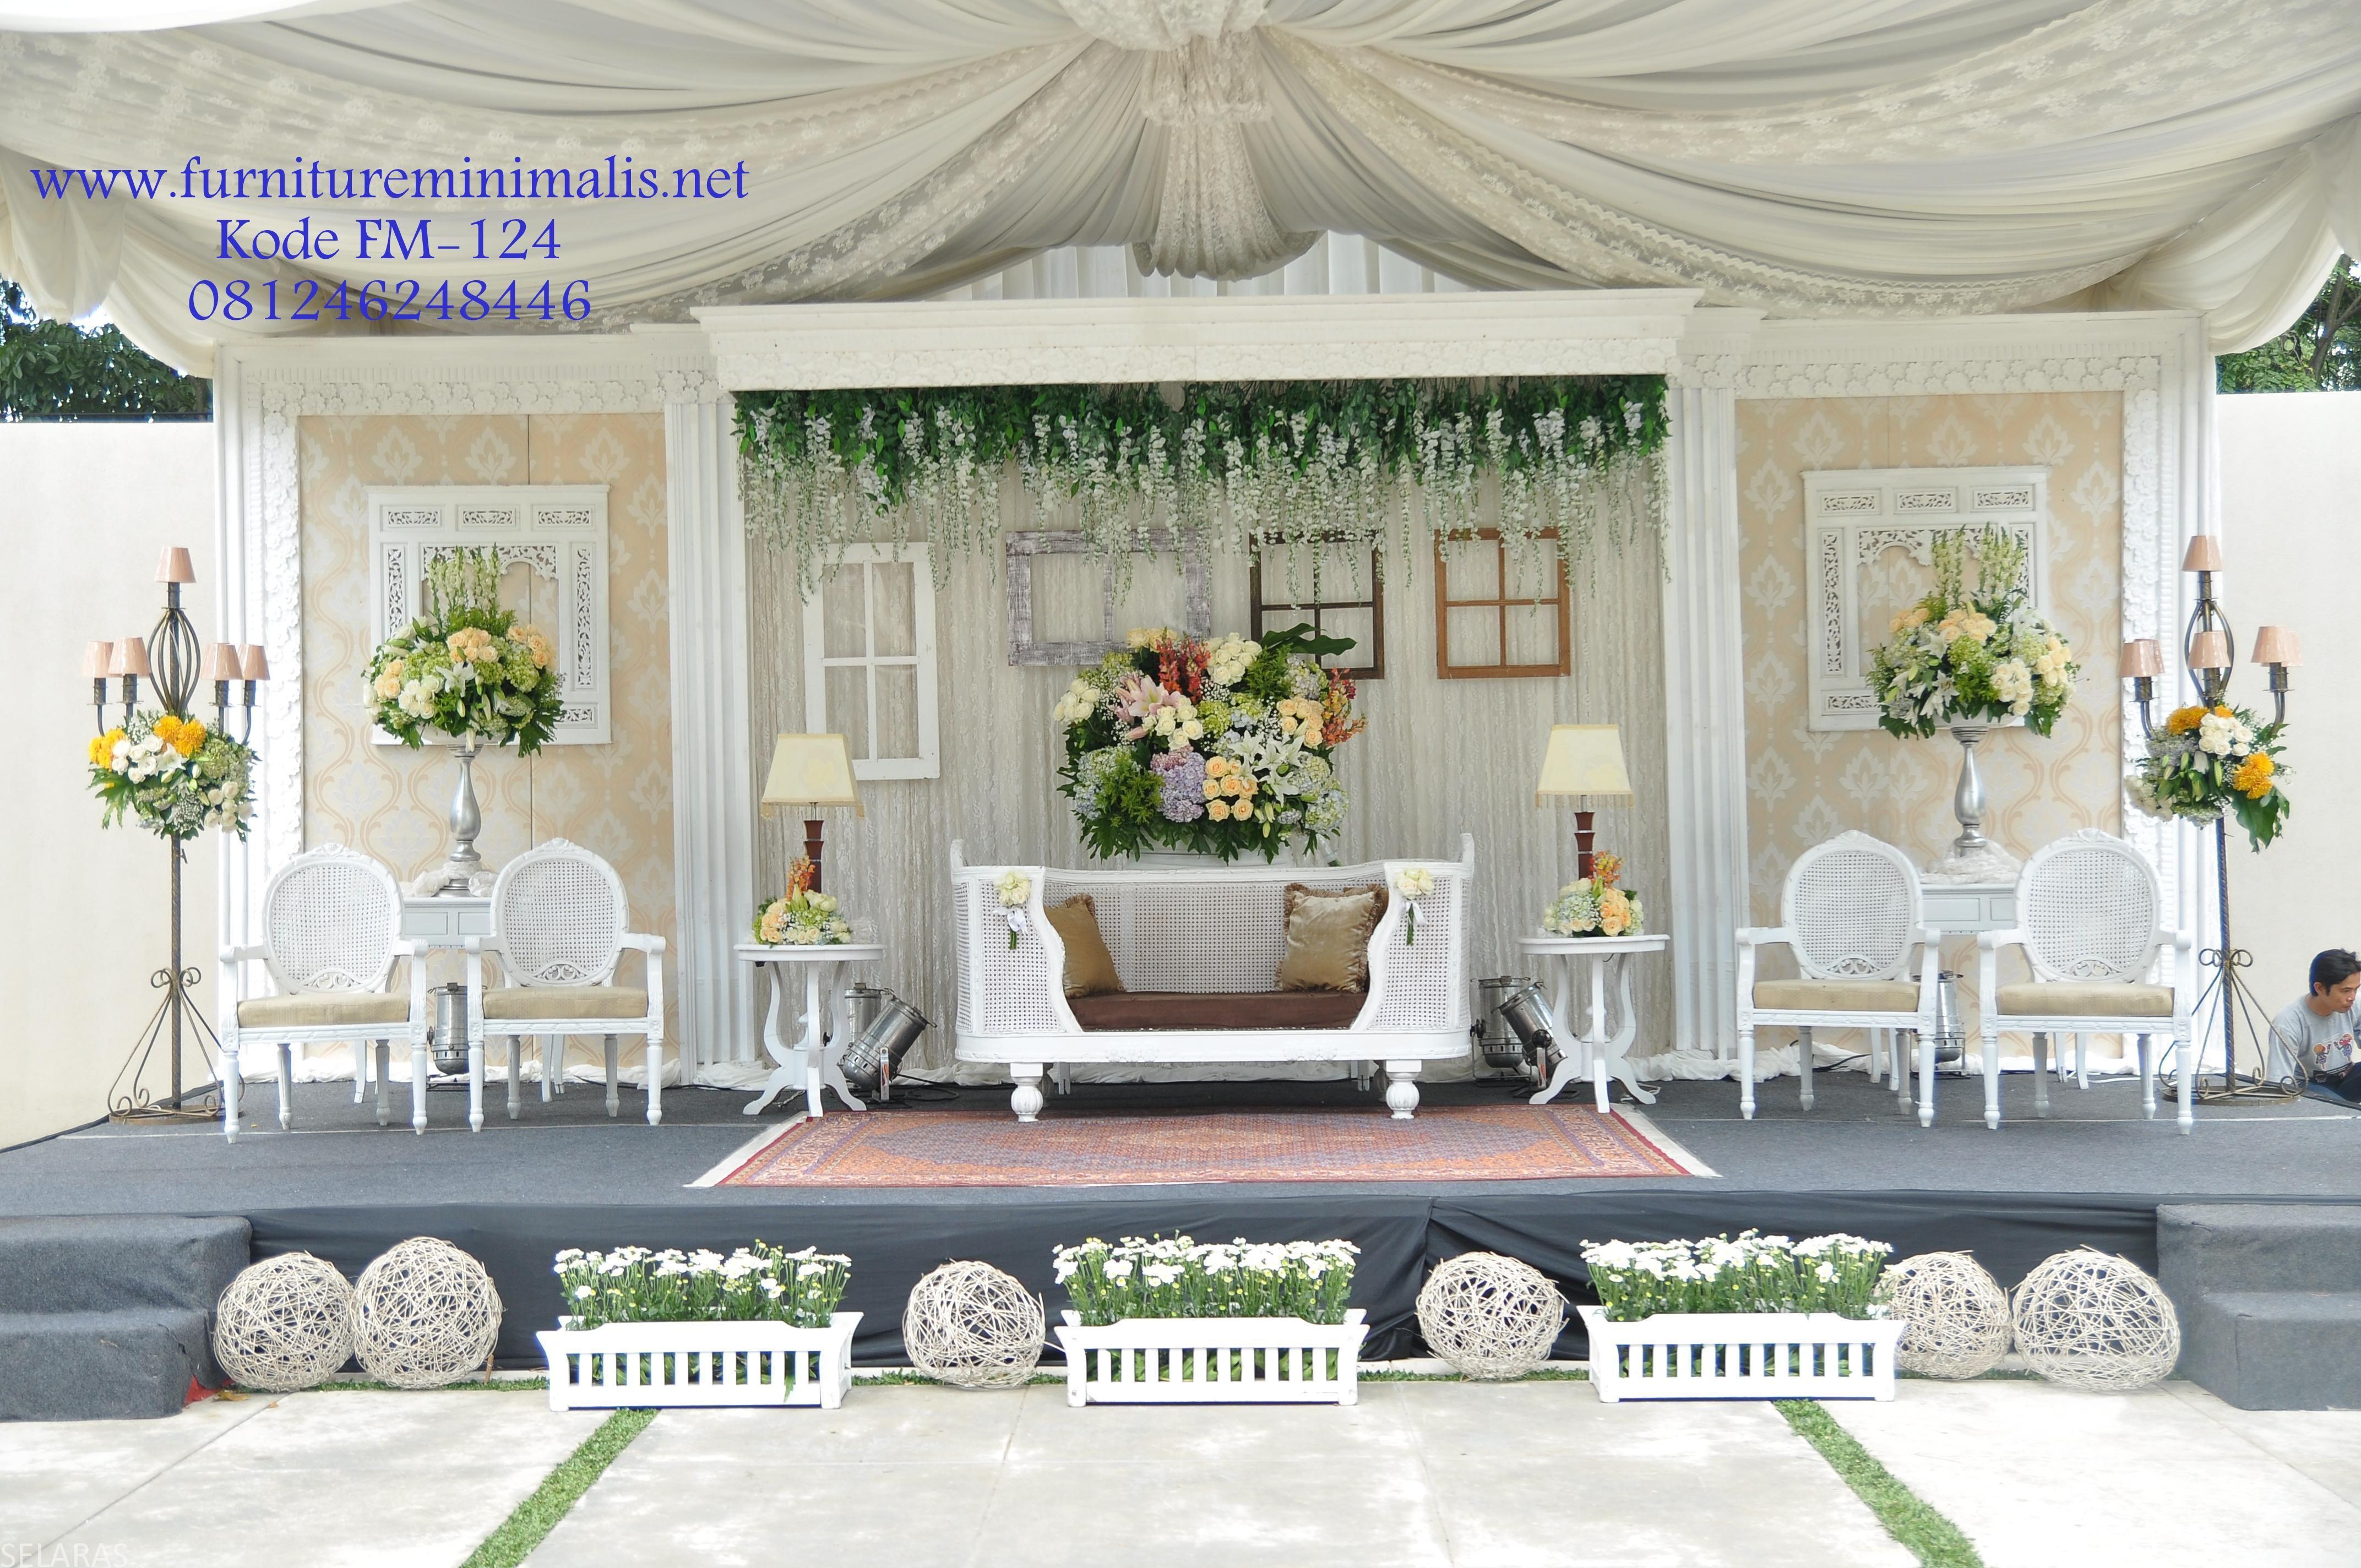 Dekorasi pelaminan minimalis sederhana duco outdoor wedding ideas dekorasi pelaminan minimalis sederhana duco outdoor junglespirit Gallery